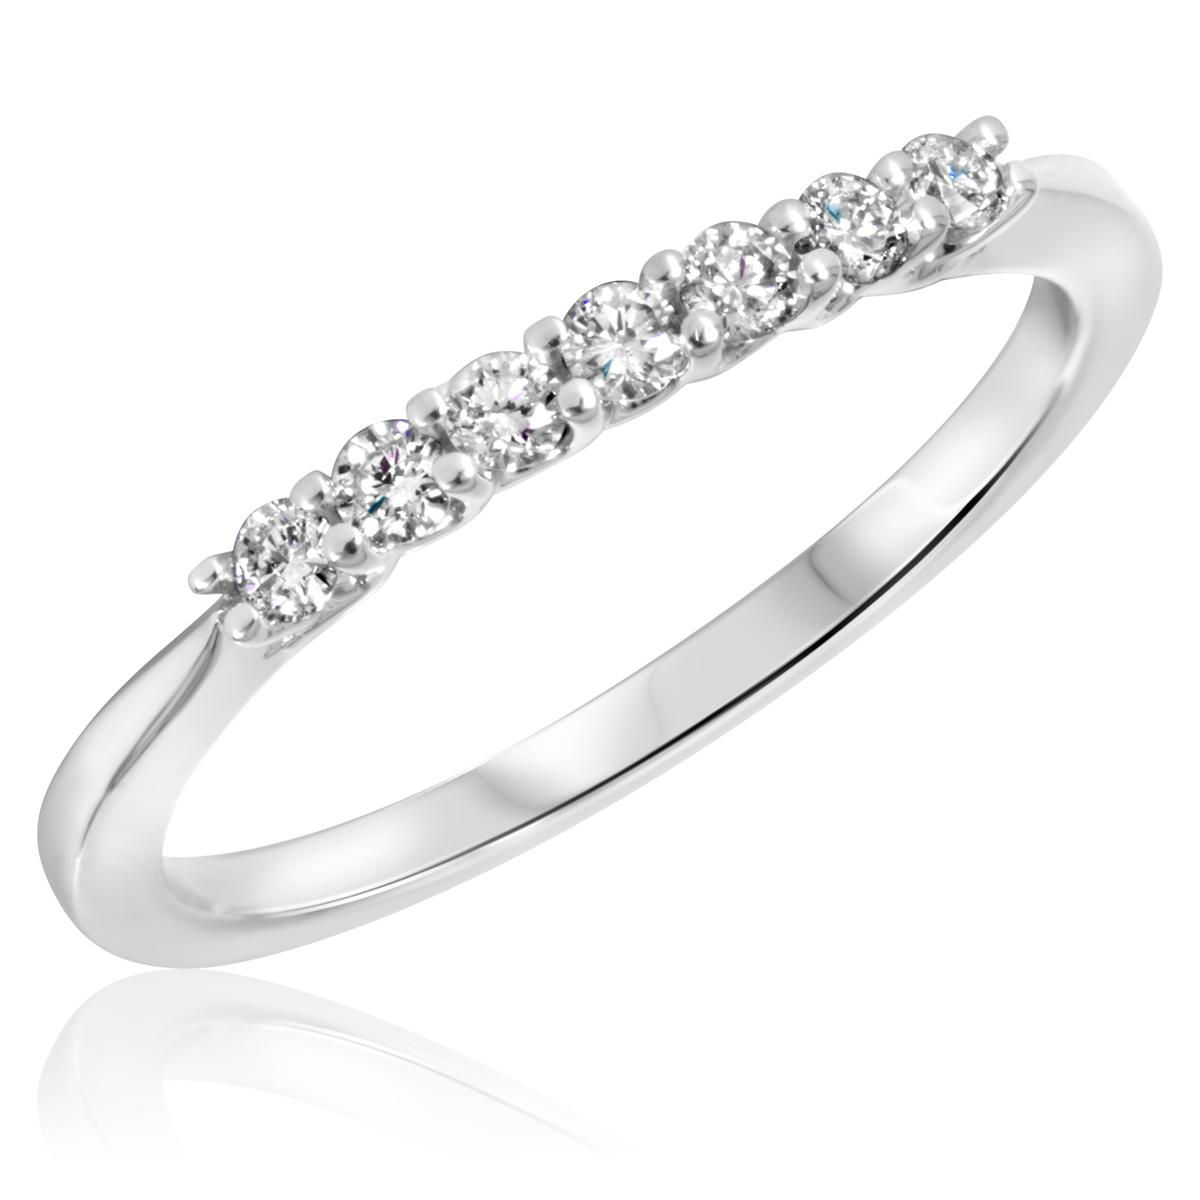 1/5 Carat T.W. Round Cut Diamond Ladies Wedding Band 10K White Gold- Size 8